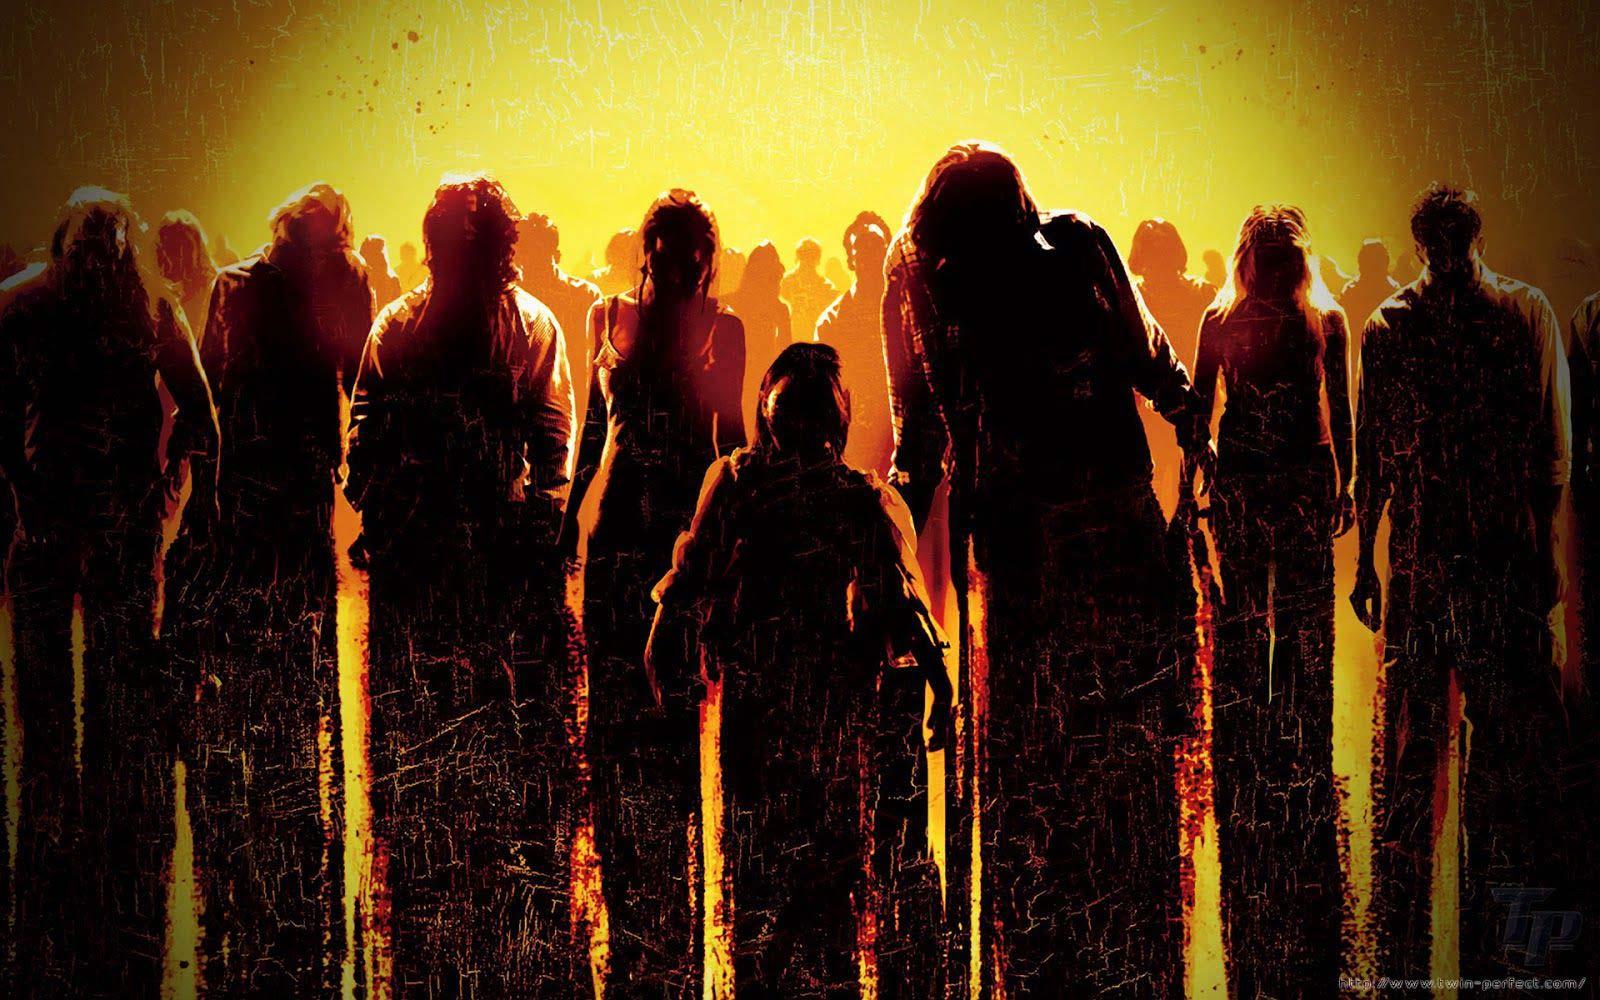 peliculas-zombies-protagonistas